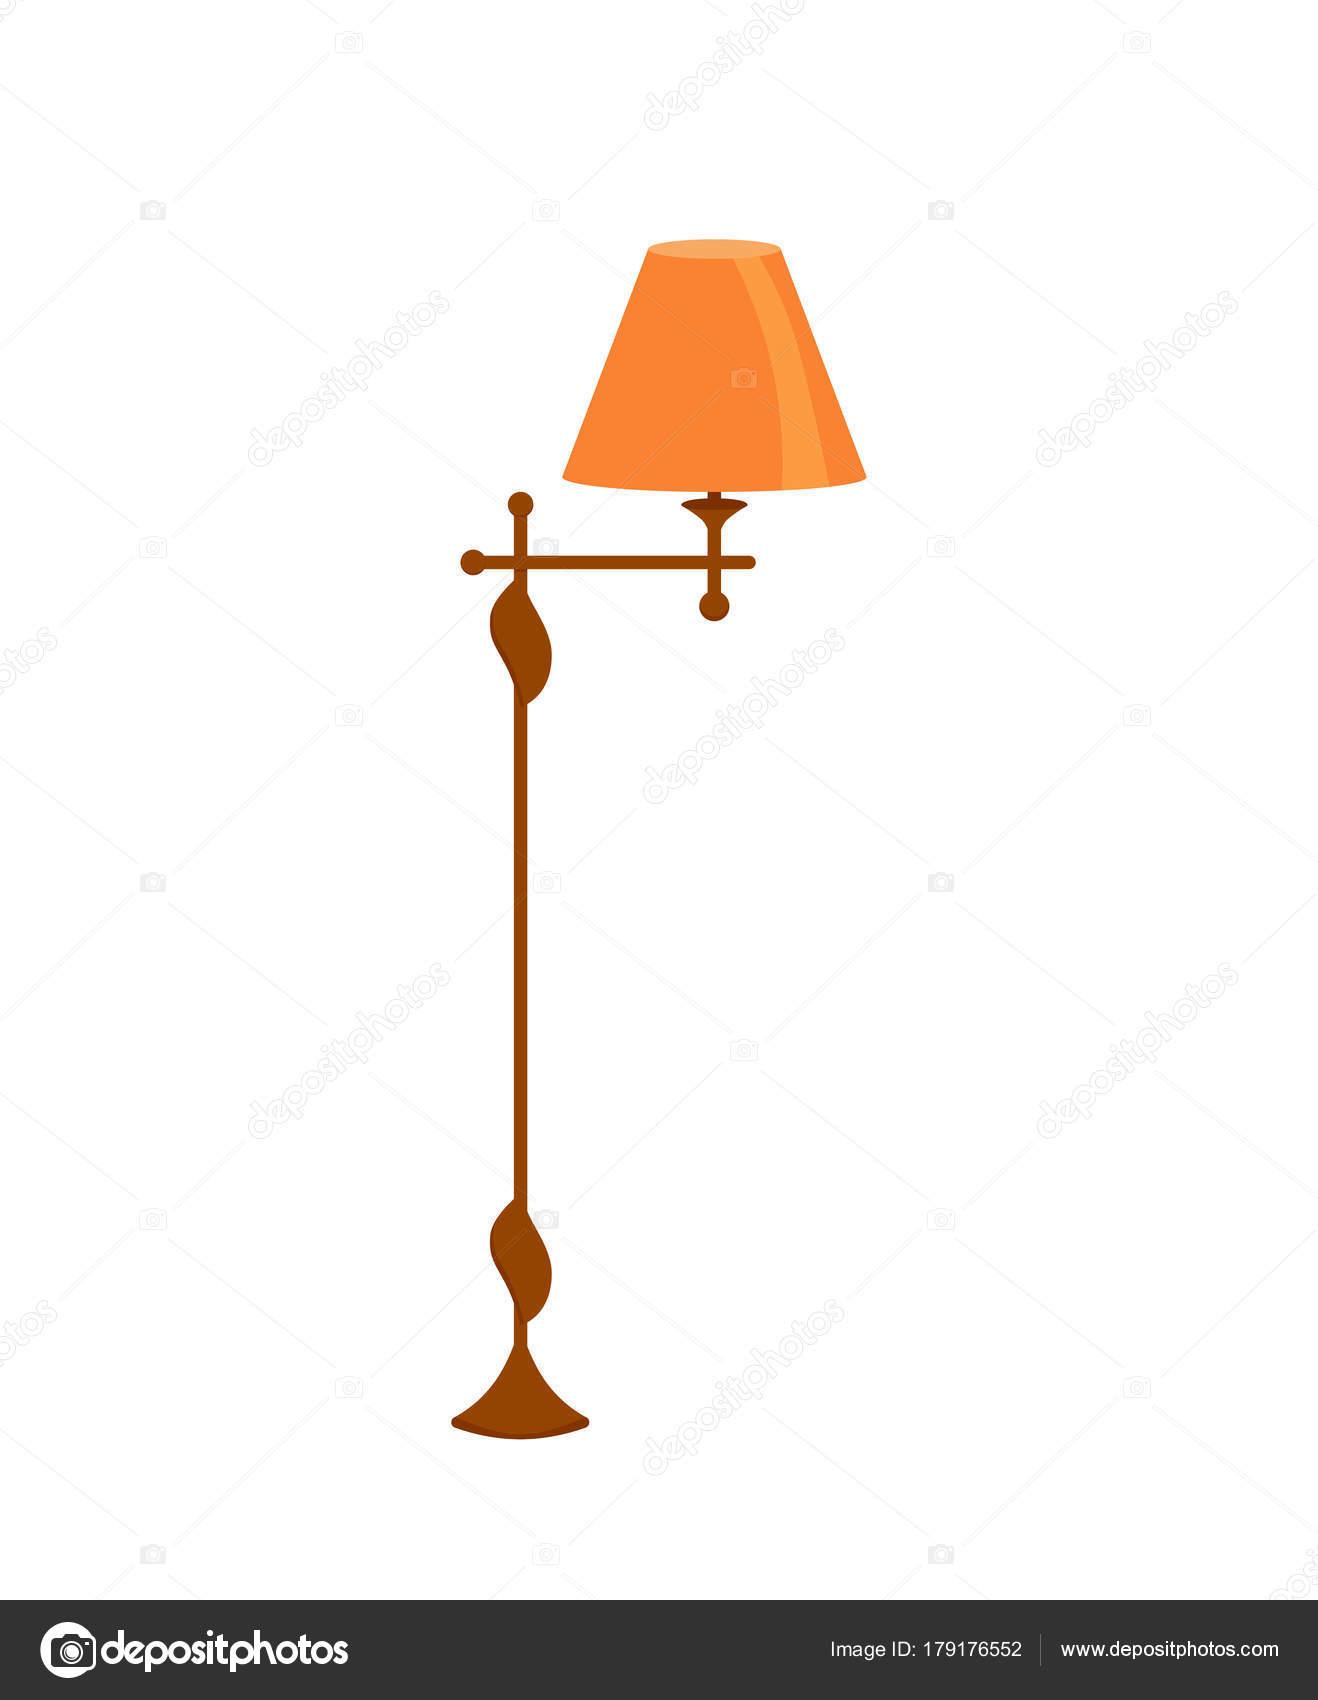 stehleuchte bunt affordable faro indoor flexi flexi pt bunte stehleuchte grn ls with. Black Bedroom Furniture Sets. Home Design Ideas